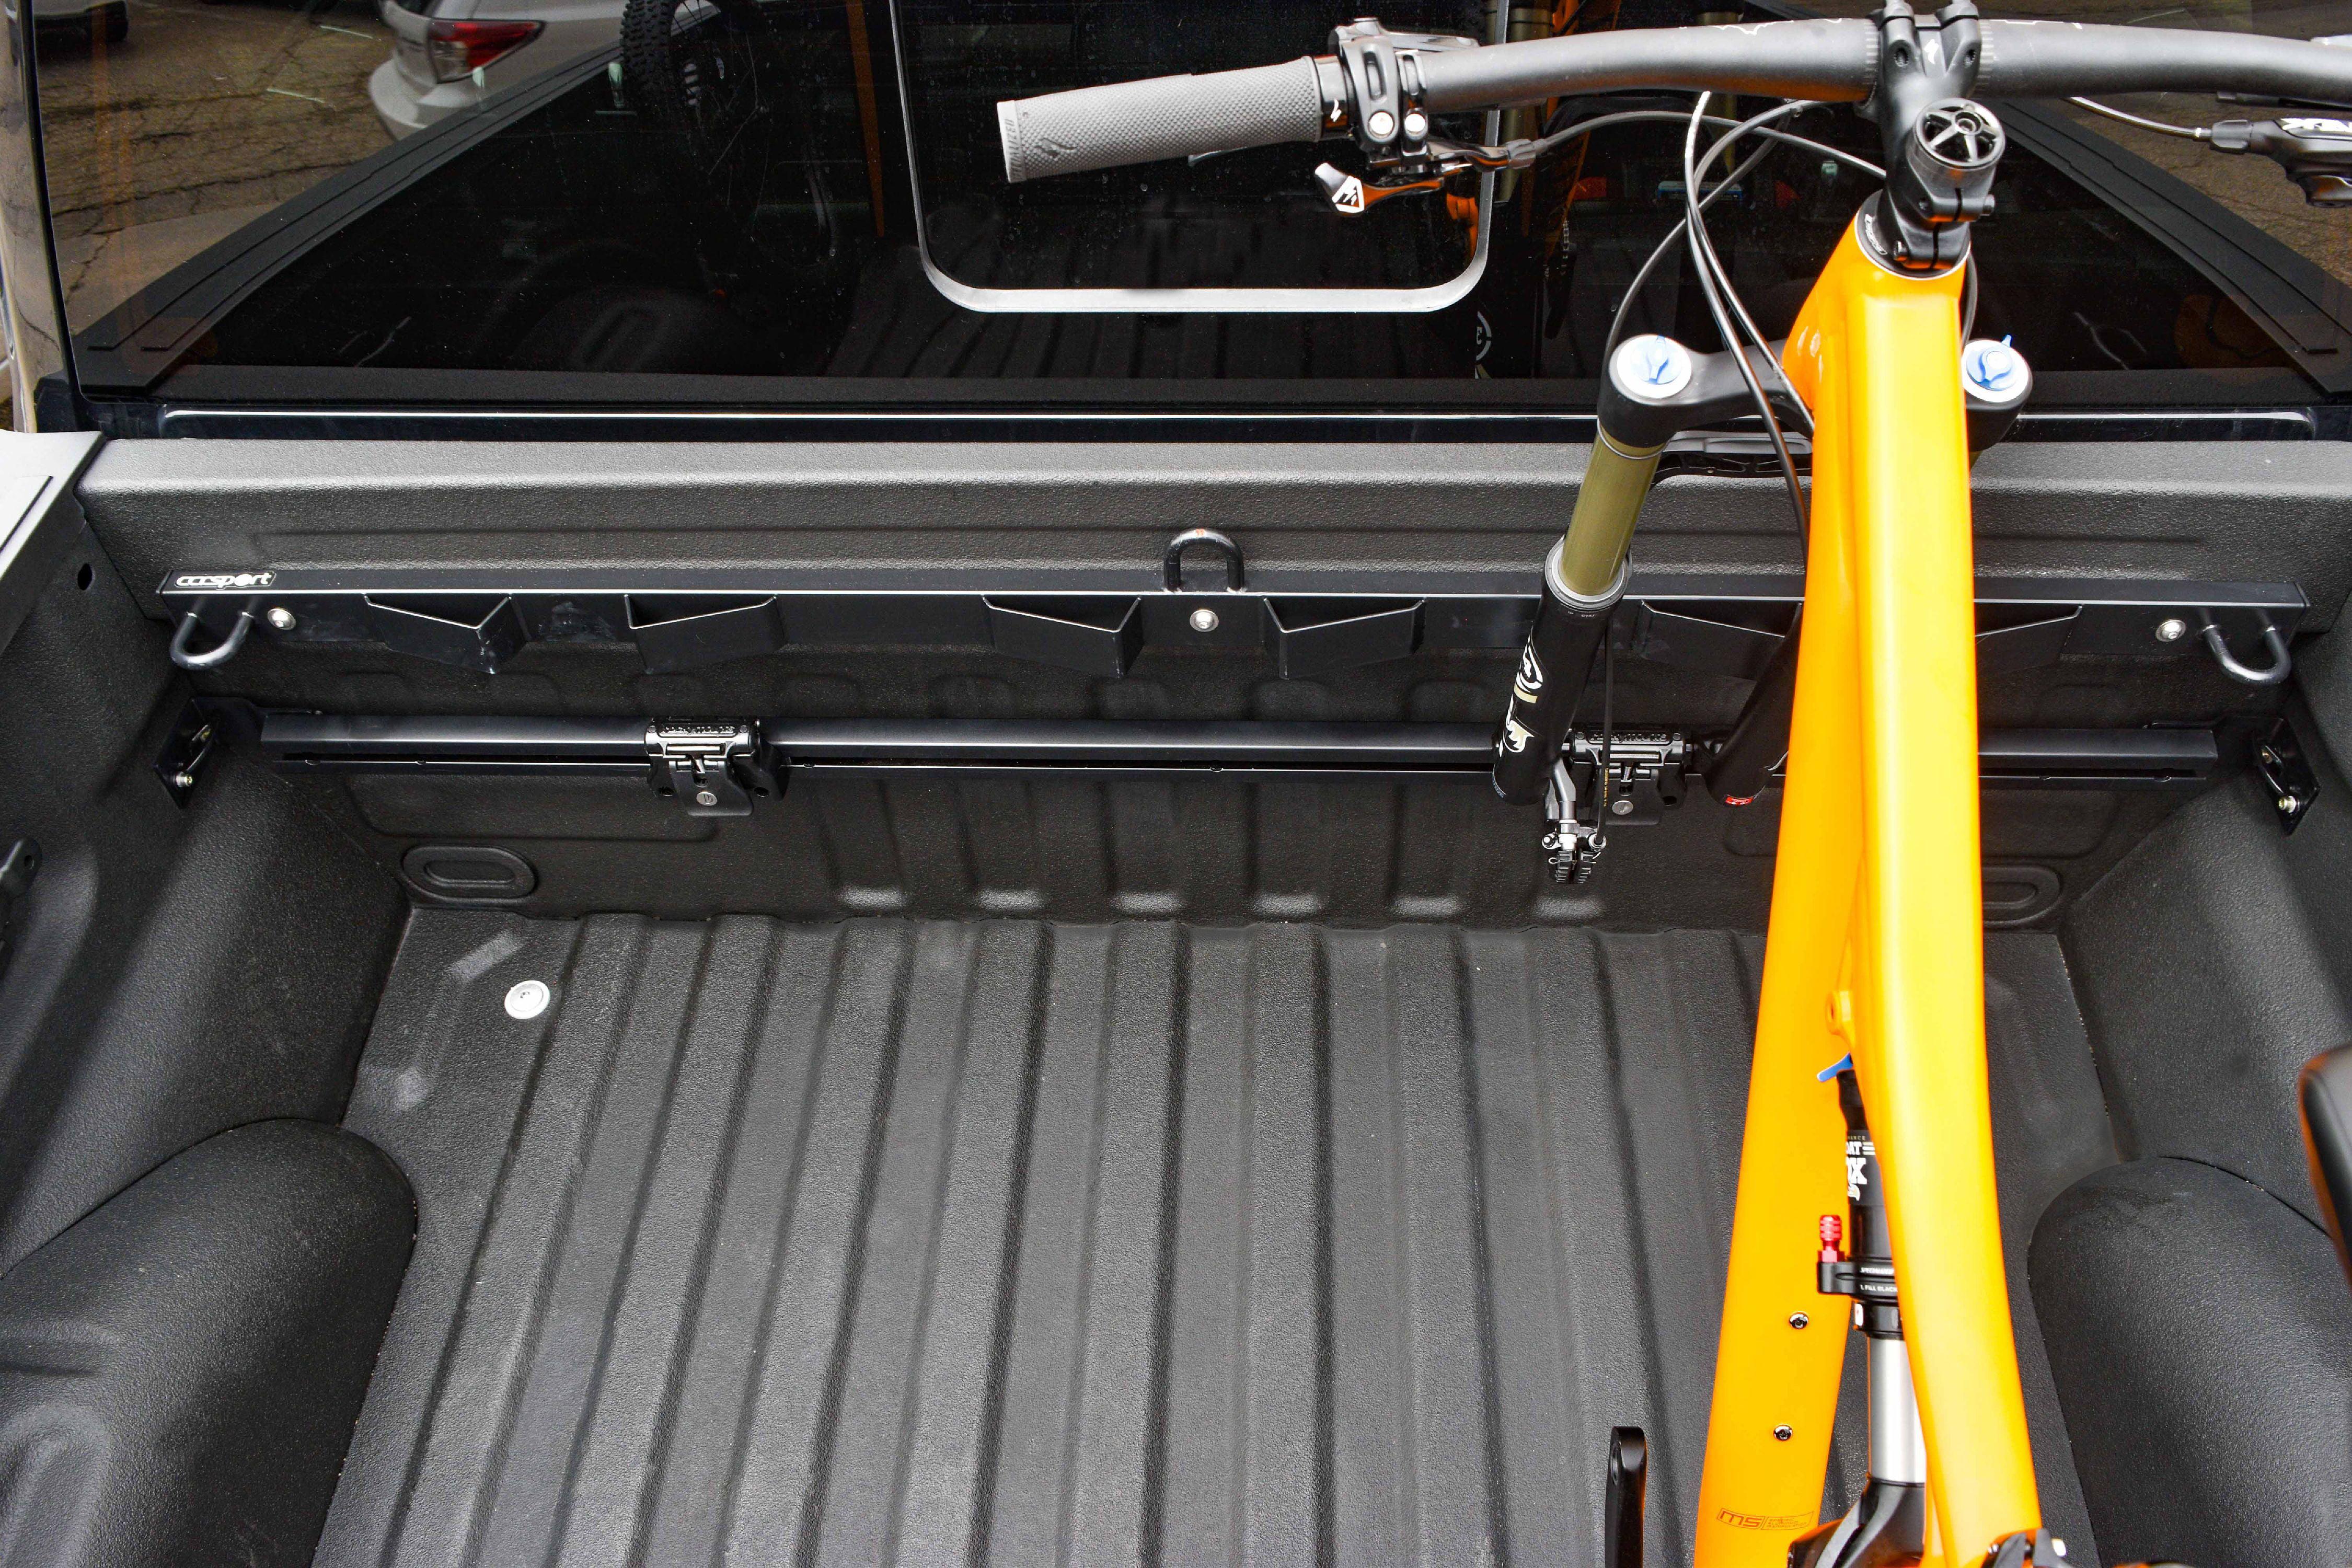 RockyMounts Ford F150 Truck Bed Track System Bike Rack by RockyMounts